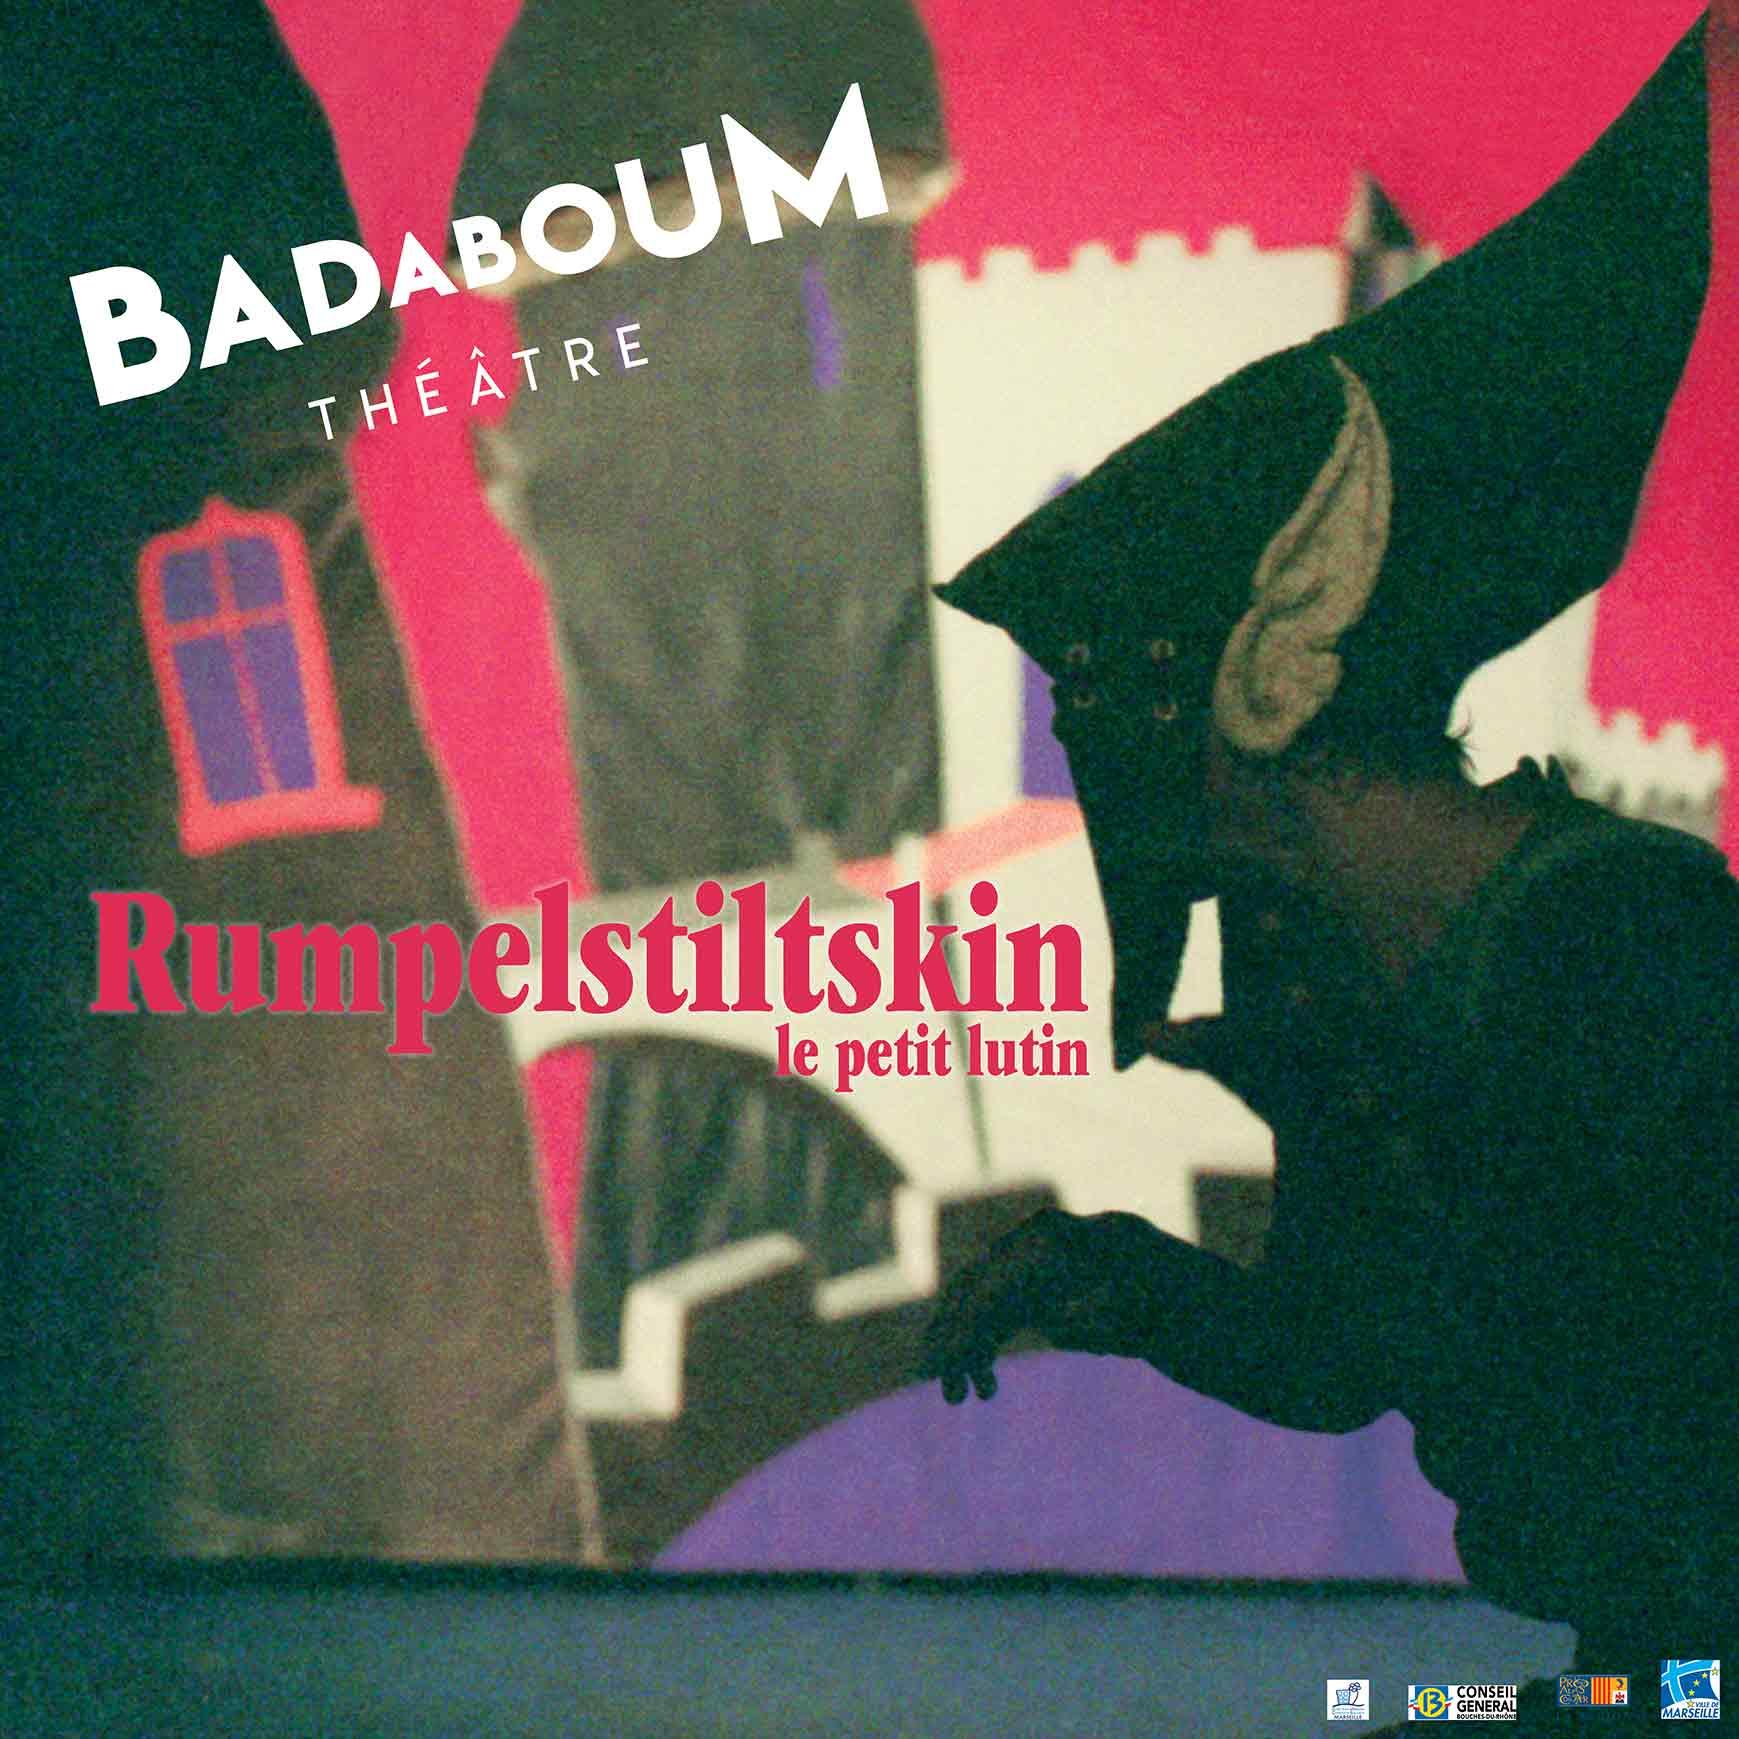 Rumpelstiltskin Spectacle enfant Badaboum theatre